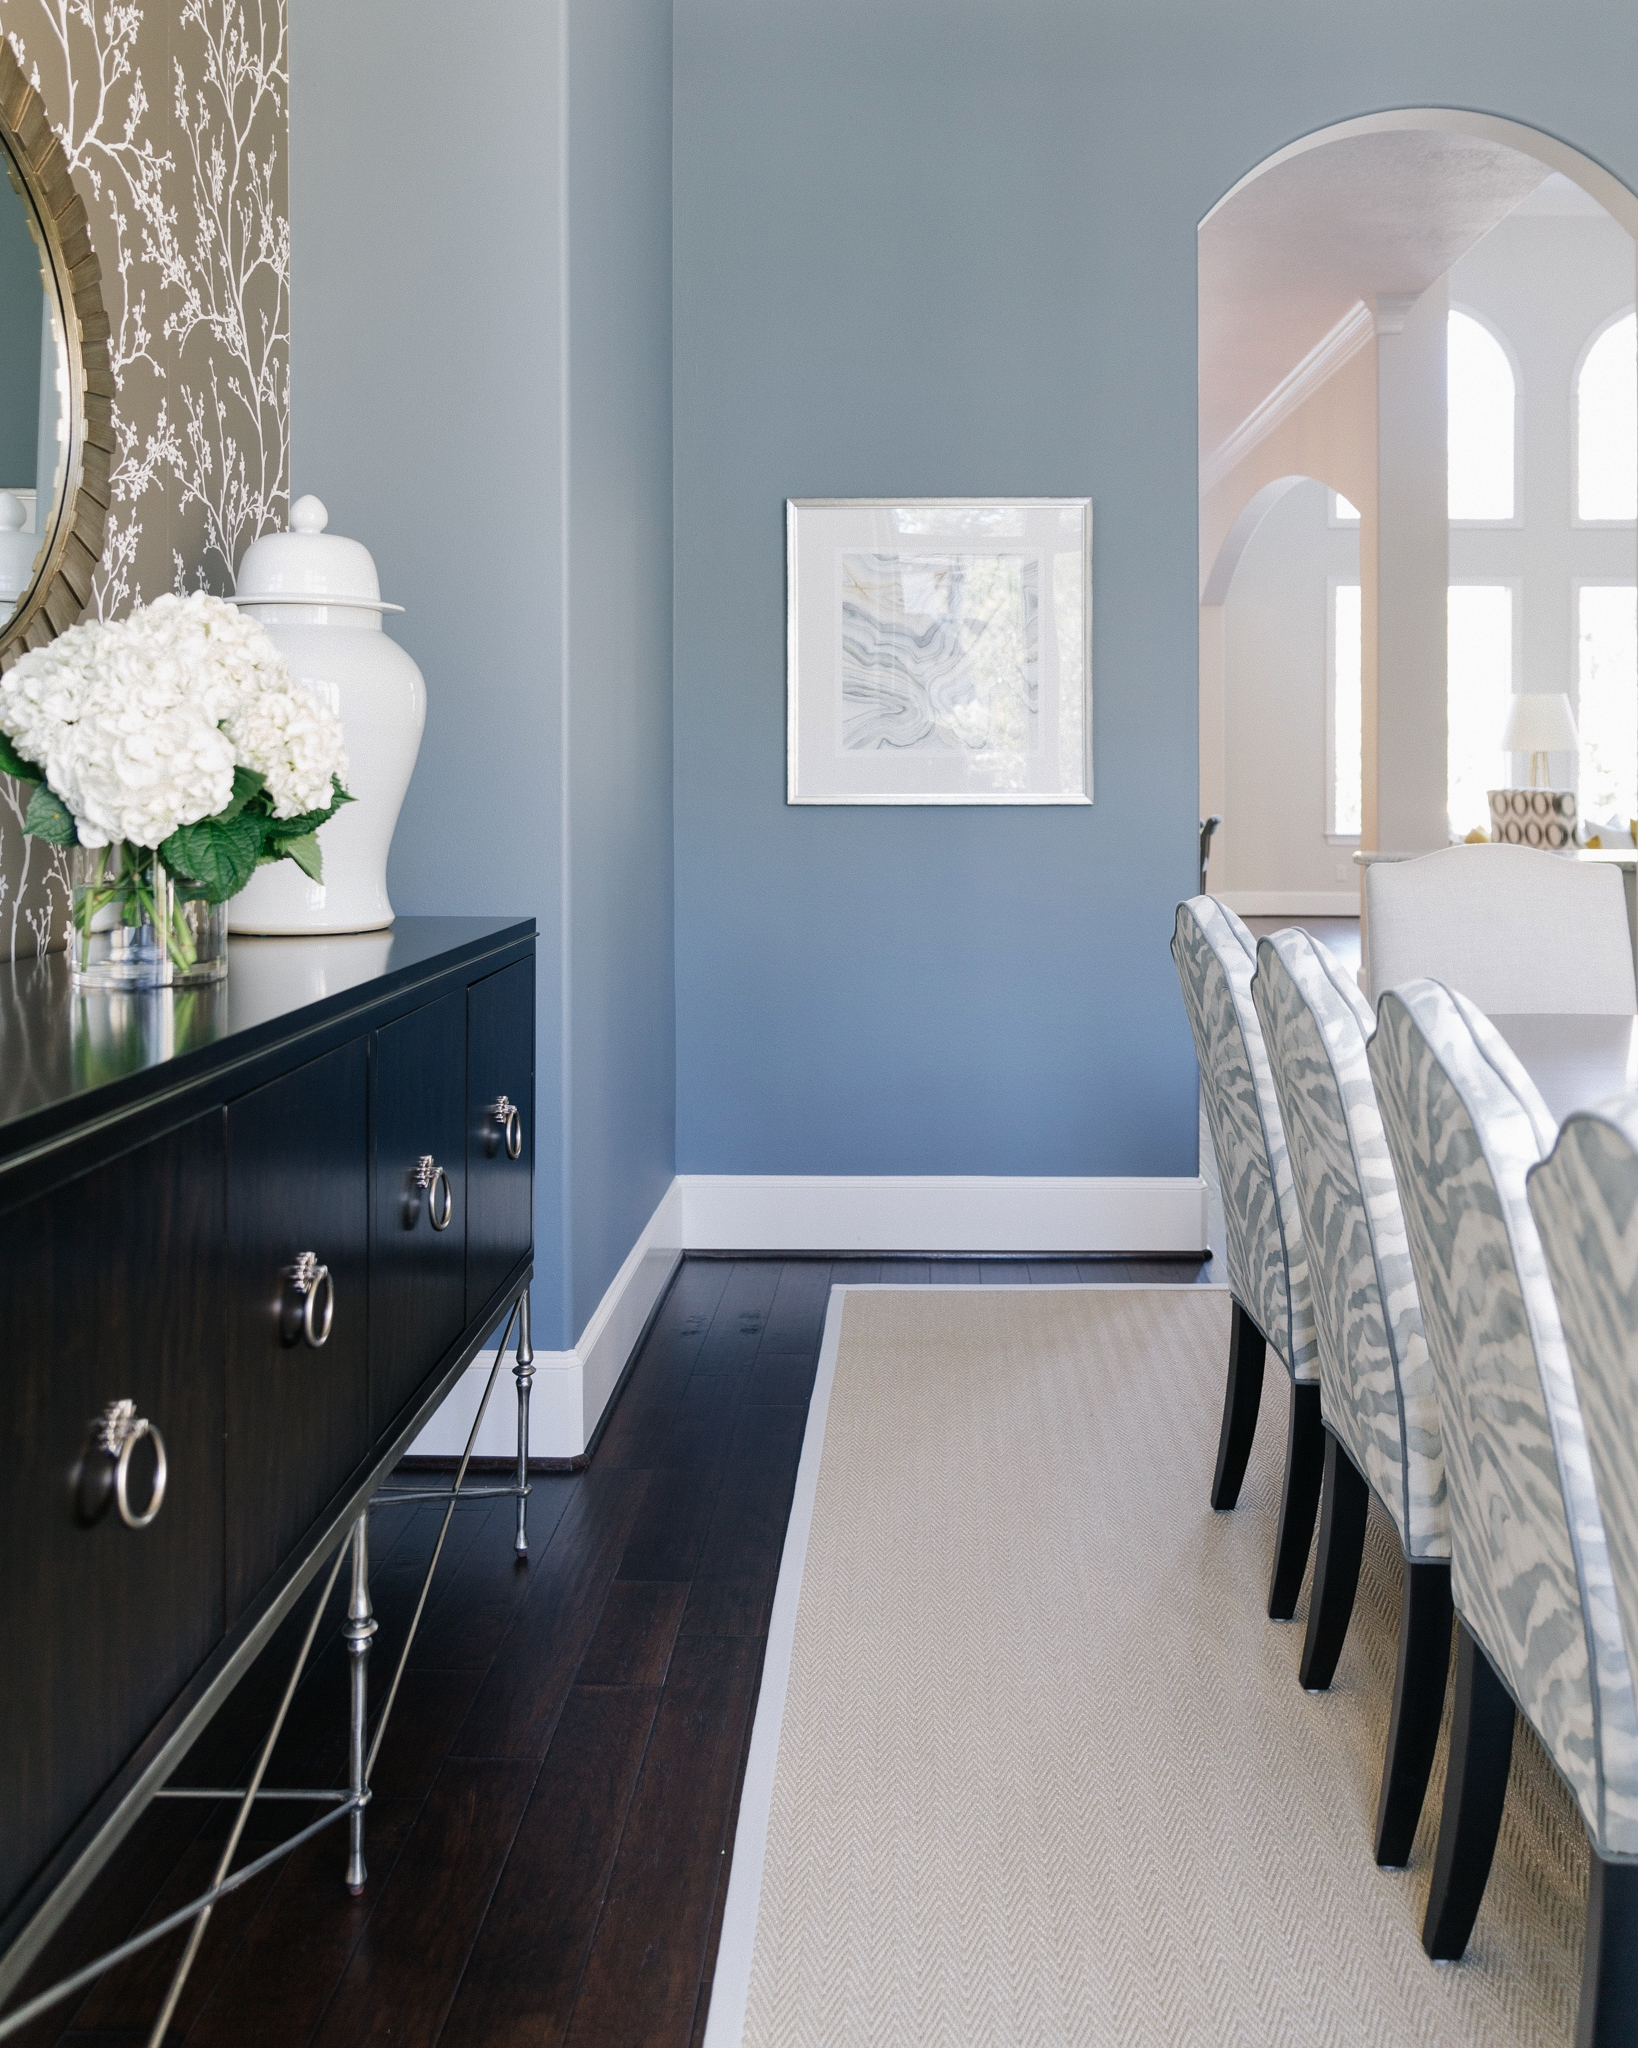 Light sisal, natural fiber rug in this dining room gave a more informal and fresh look to the space. Blue dining room, Designer: Carla Aston, Photographer: Colleen Scott | #diningroom #sisalrug #diningroomideas #naturalfiberrug